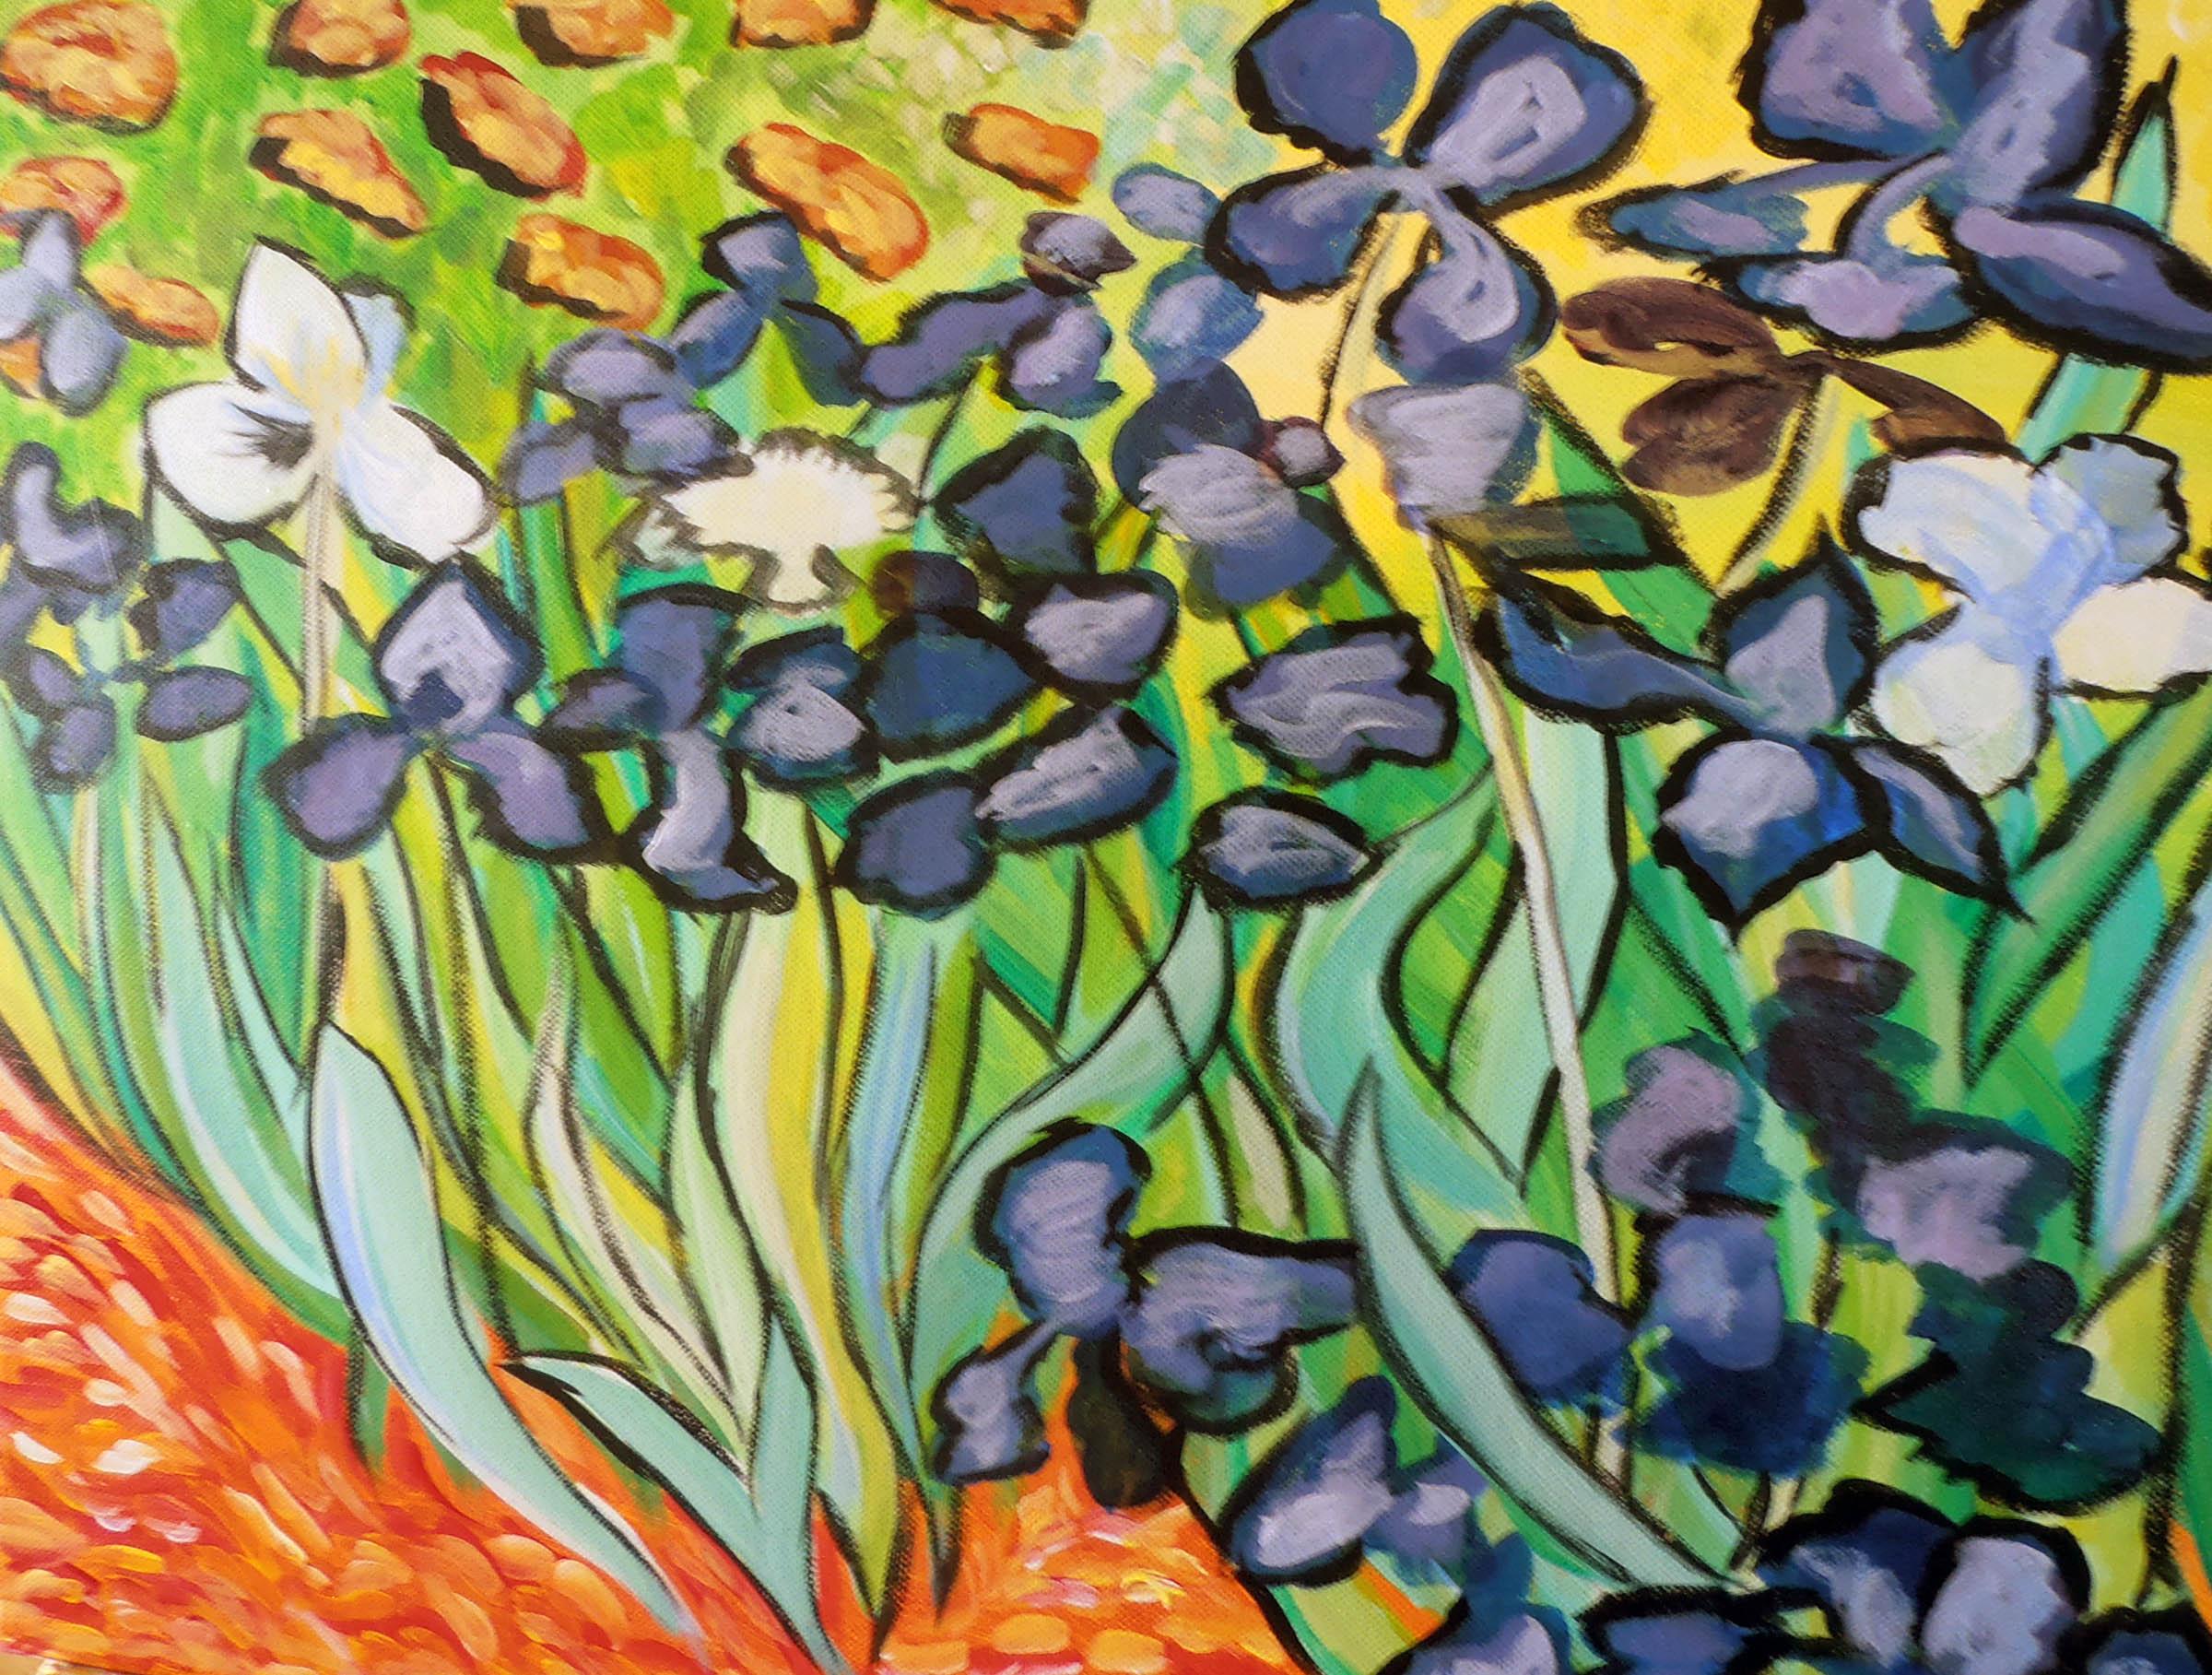 Van Gogh Style Irises